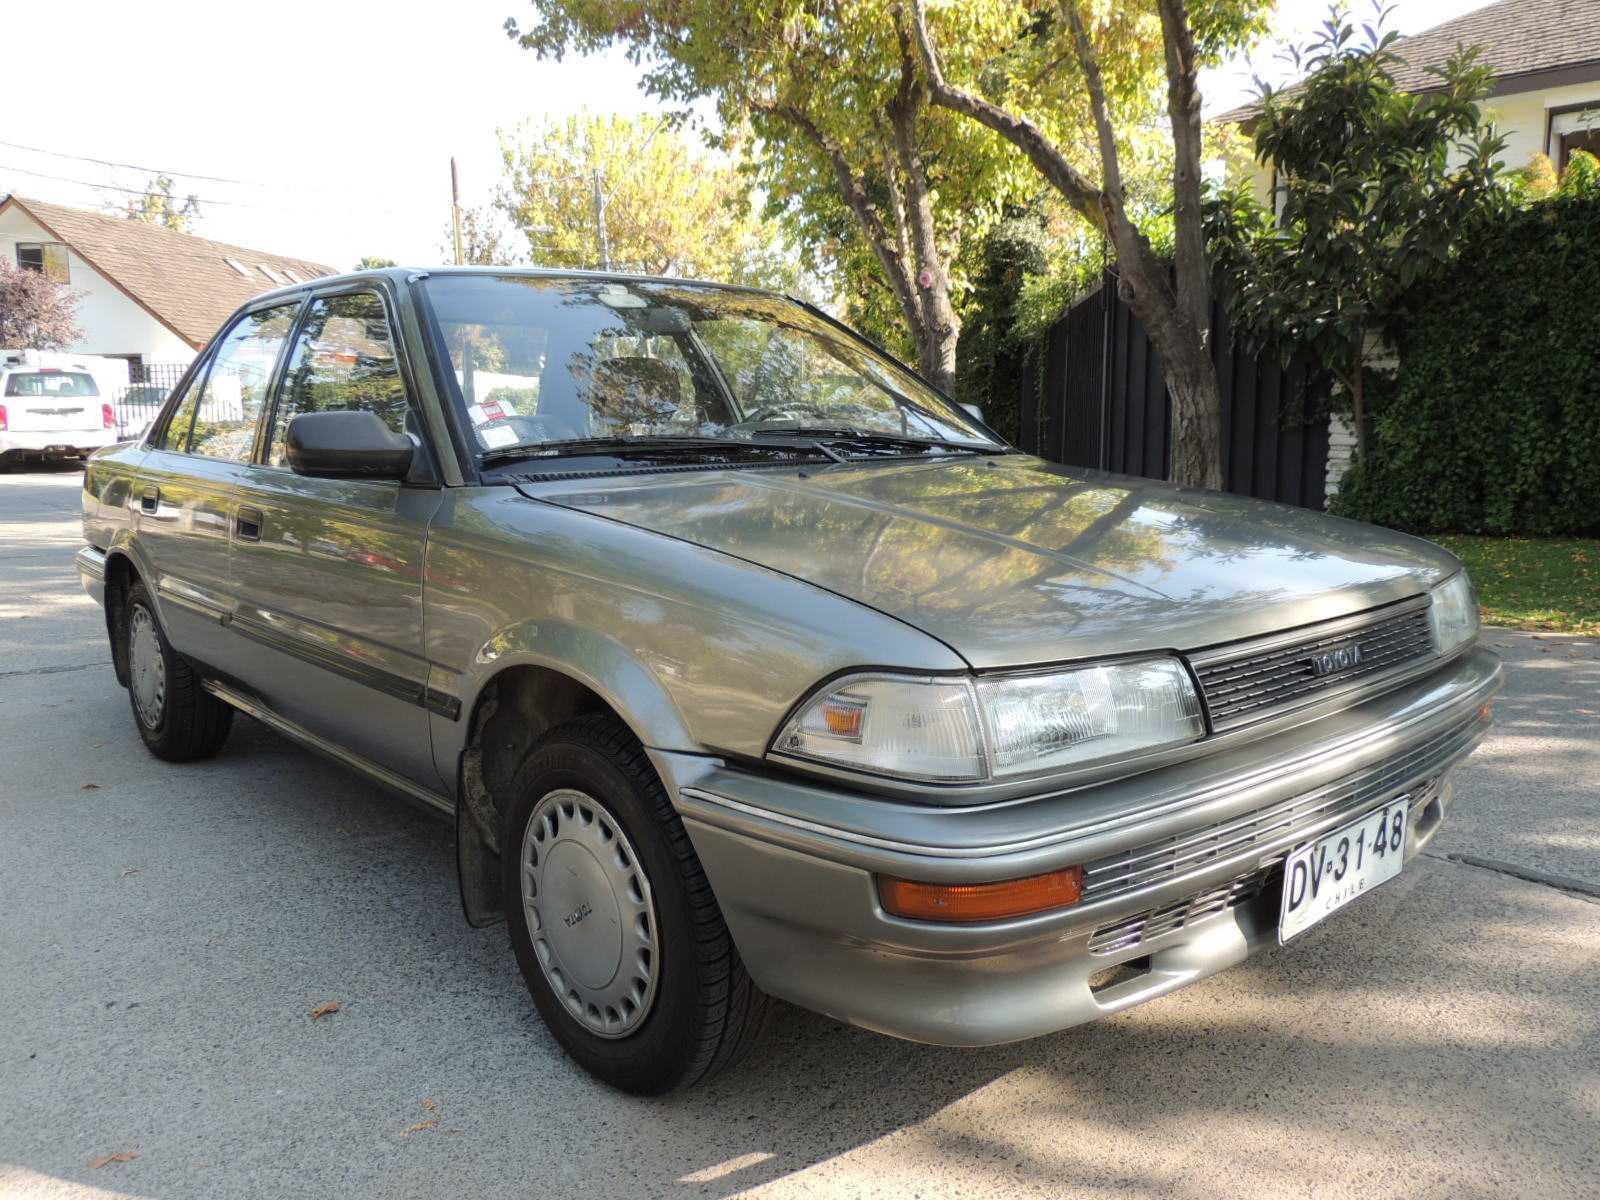 Toyota Corolla 1992 Flaco Farias Retrotest (20)